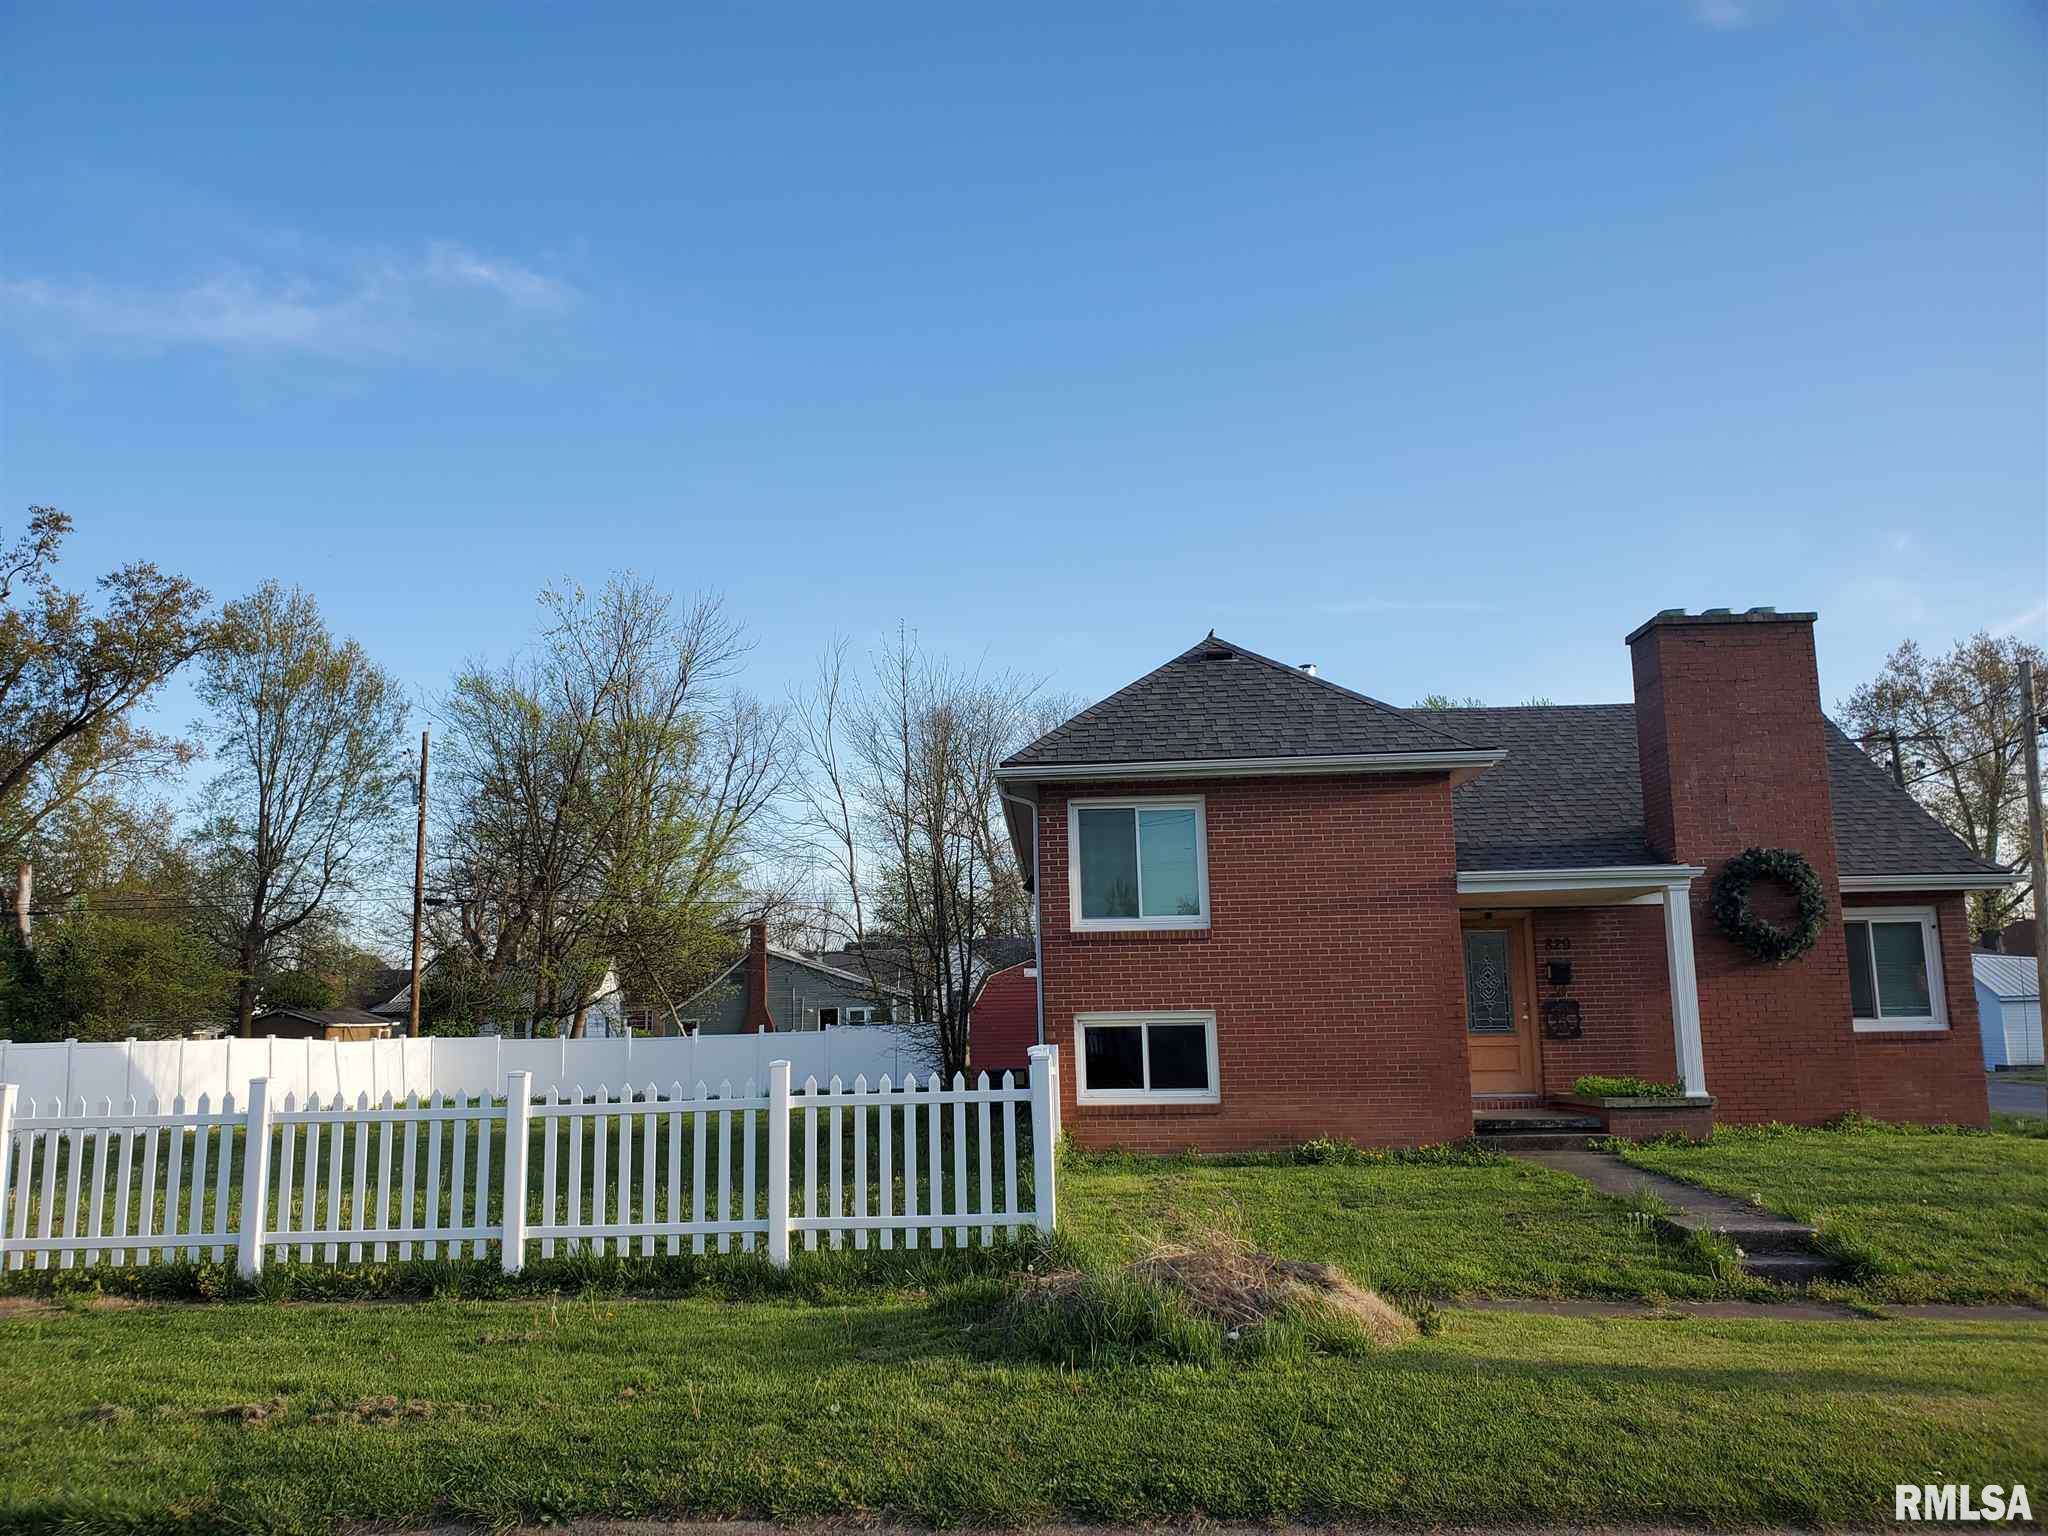 829 DEWEY Property Photo - Eldorado, IL real estate listing